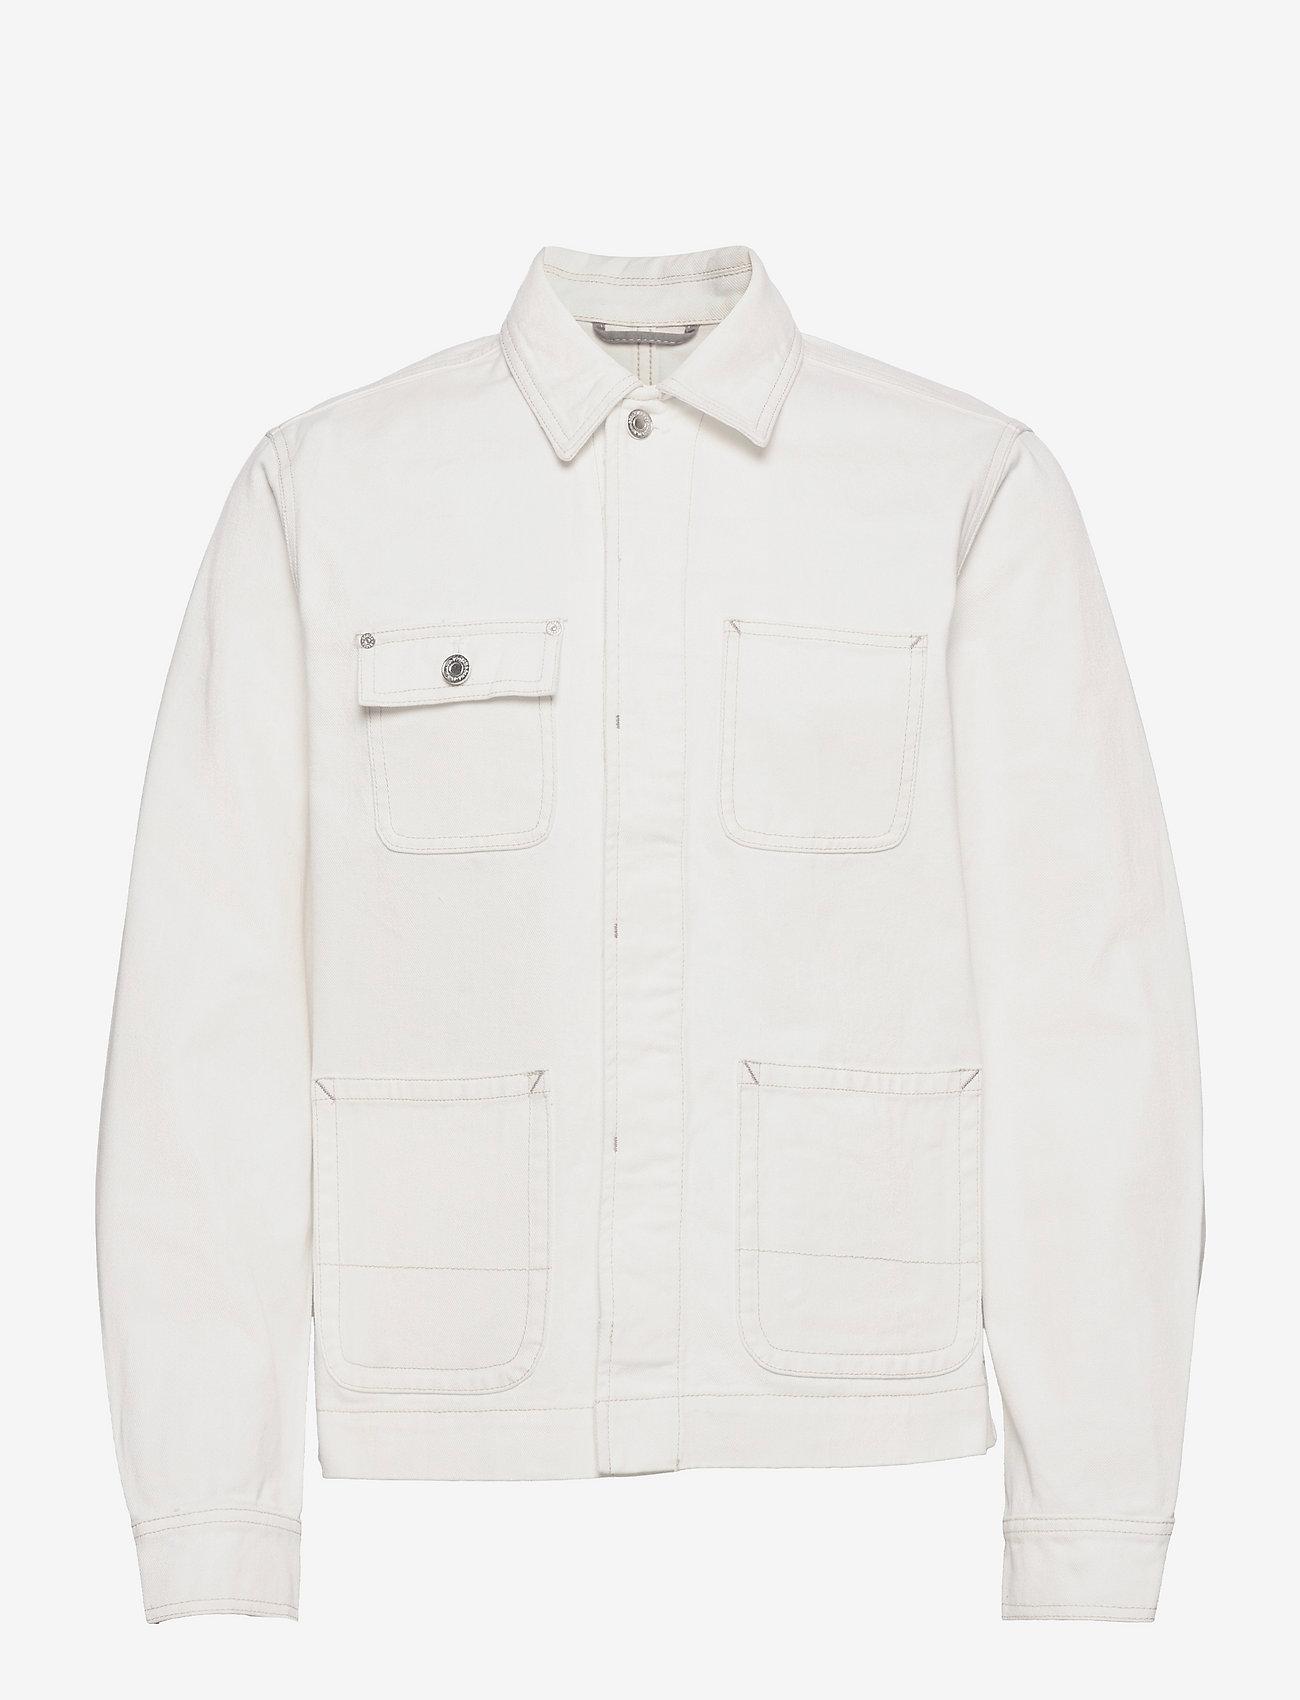 Scotch & Soda - Ams Blauw workwear shirt jacket - spijkerjassen - workwear white - 0